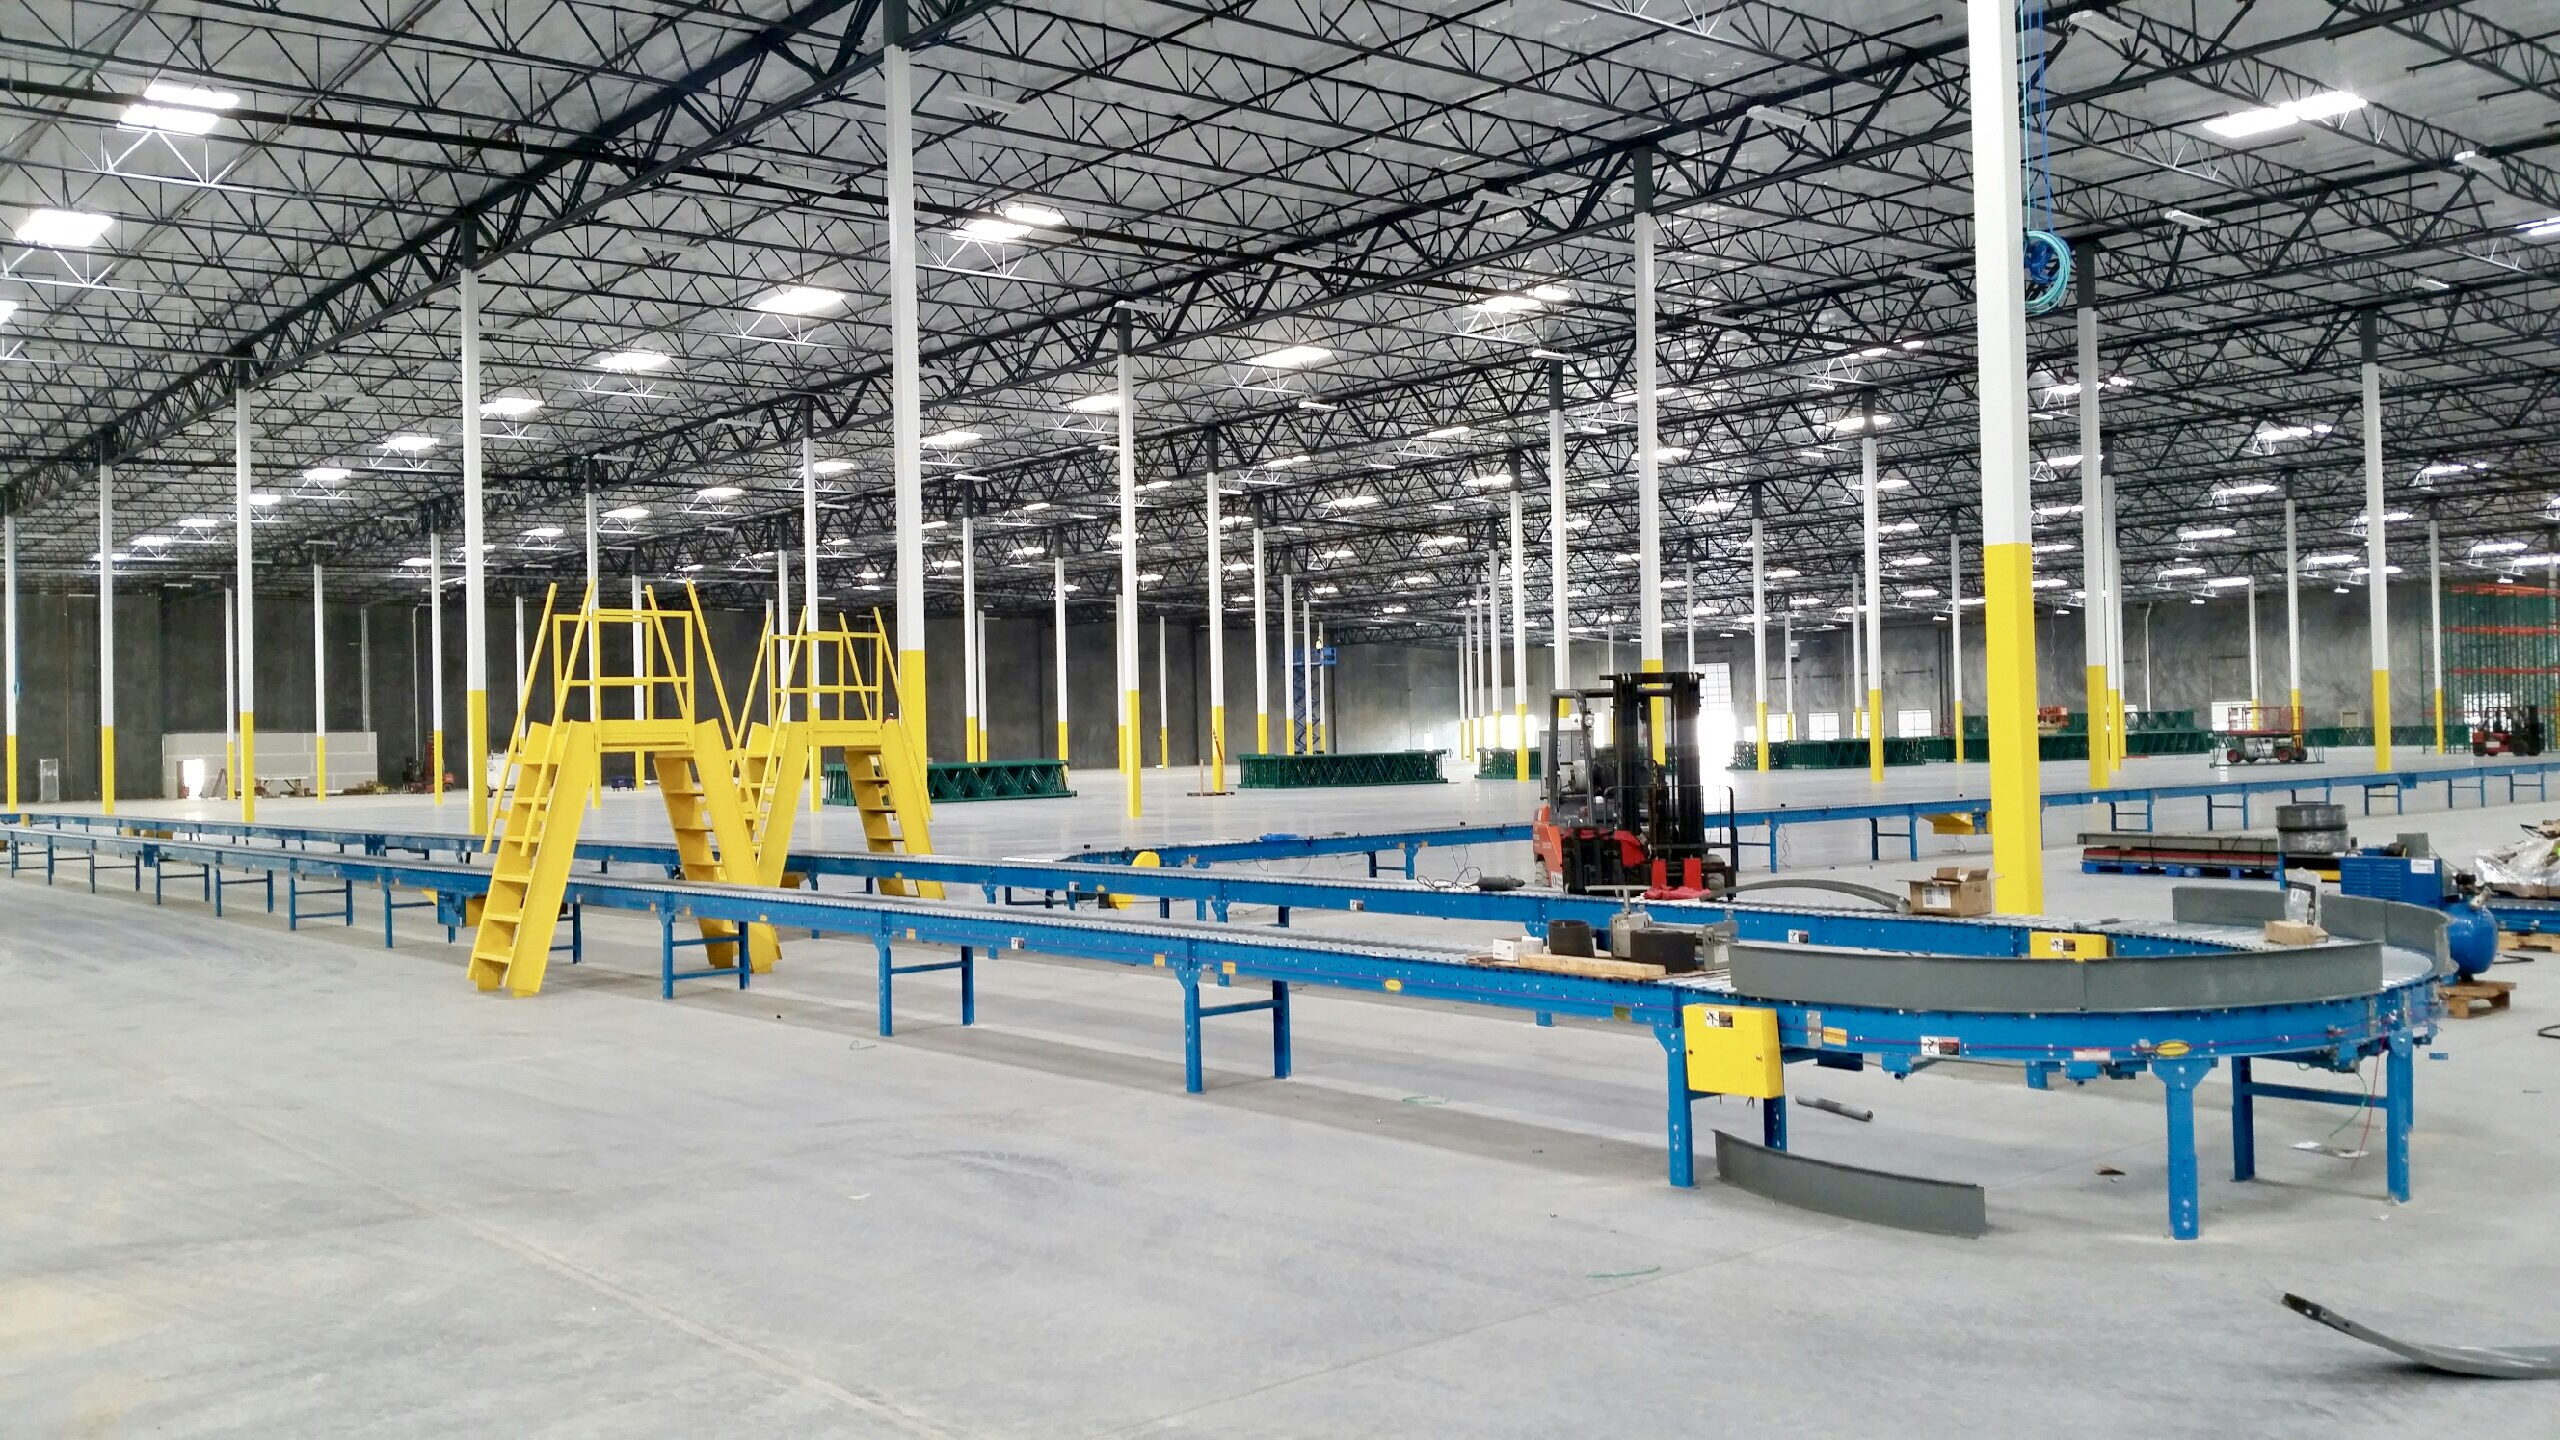 ergonomics safety tips for warehouse conveyors blog the shelving blog. Black Bedroom Furniture Sets. Home Design Ideas